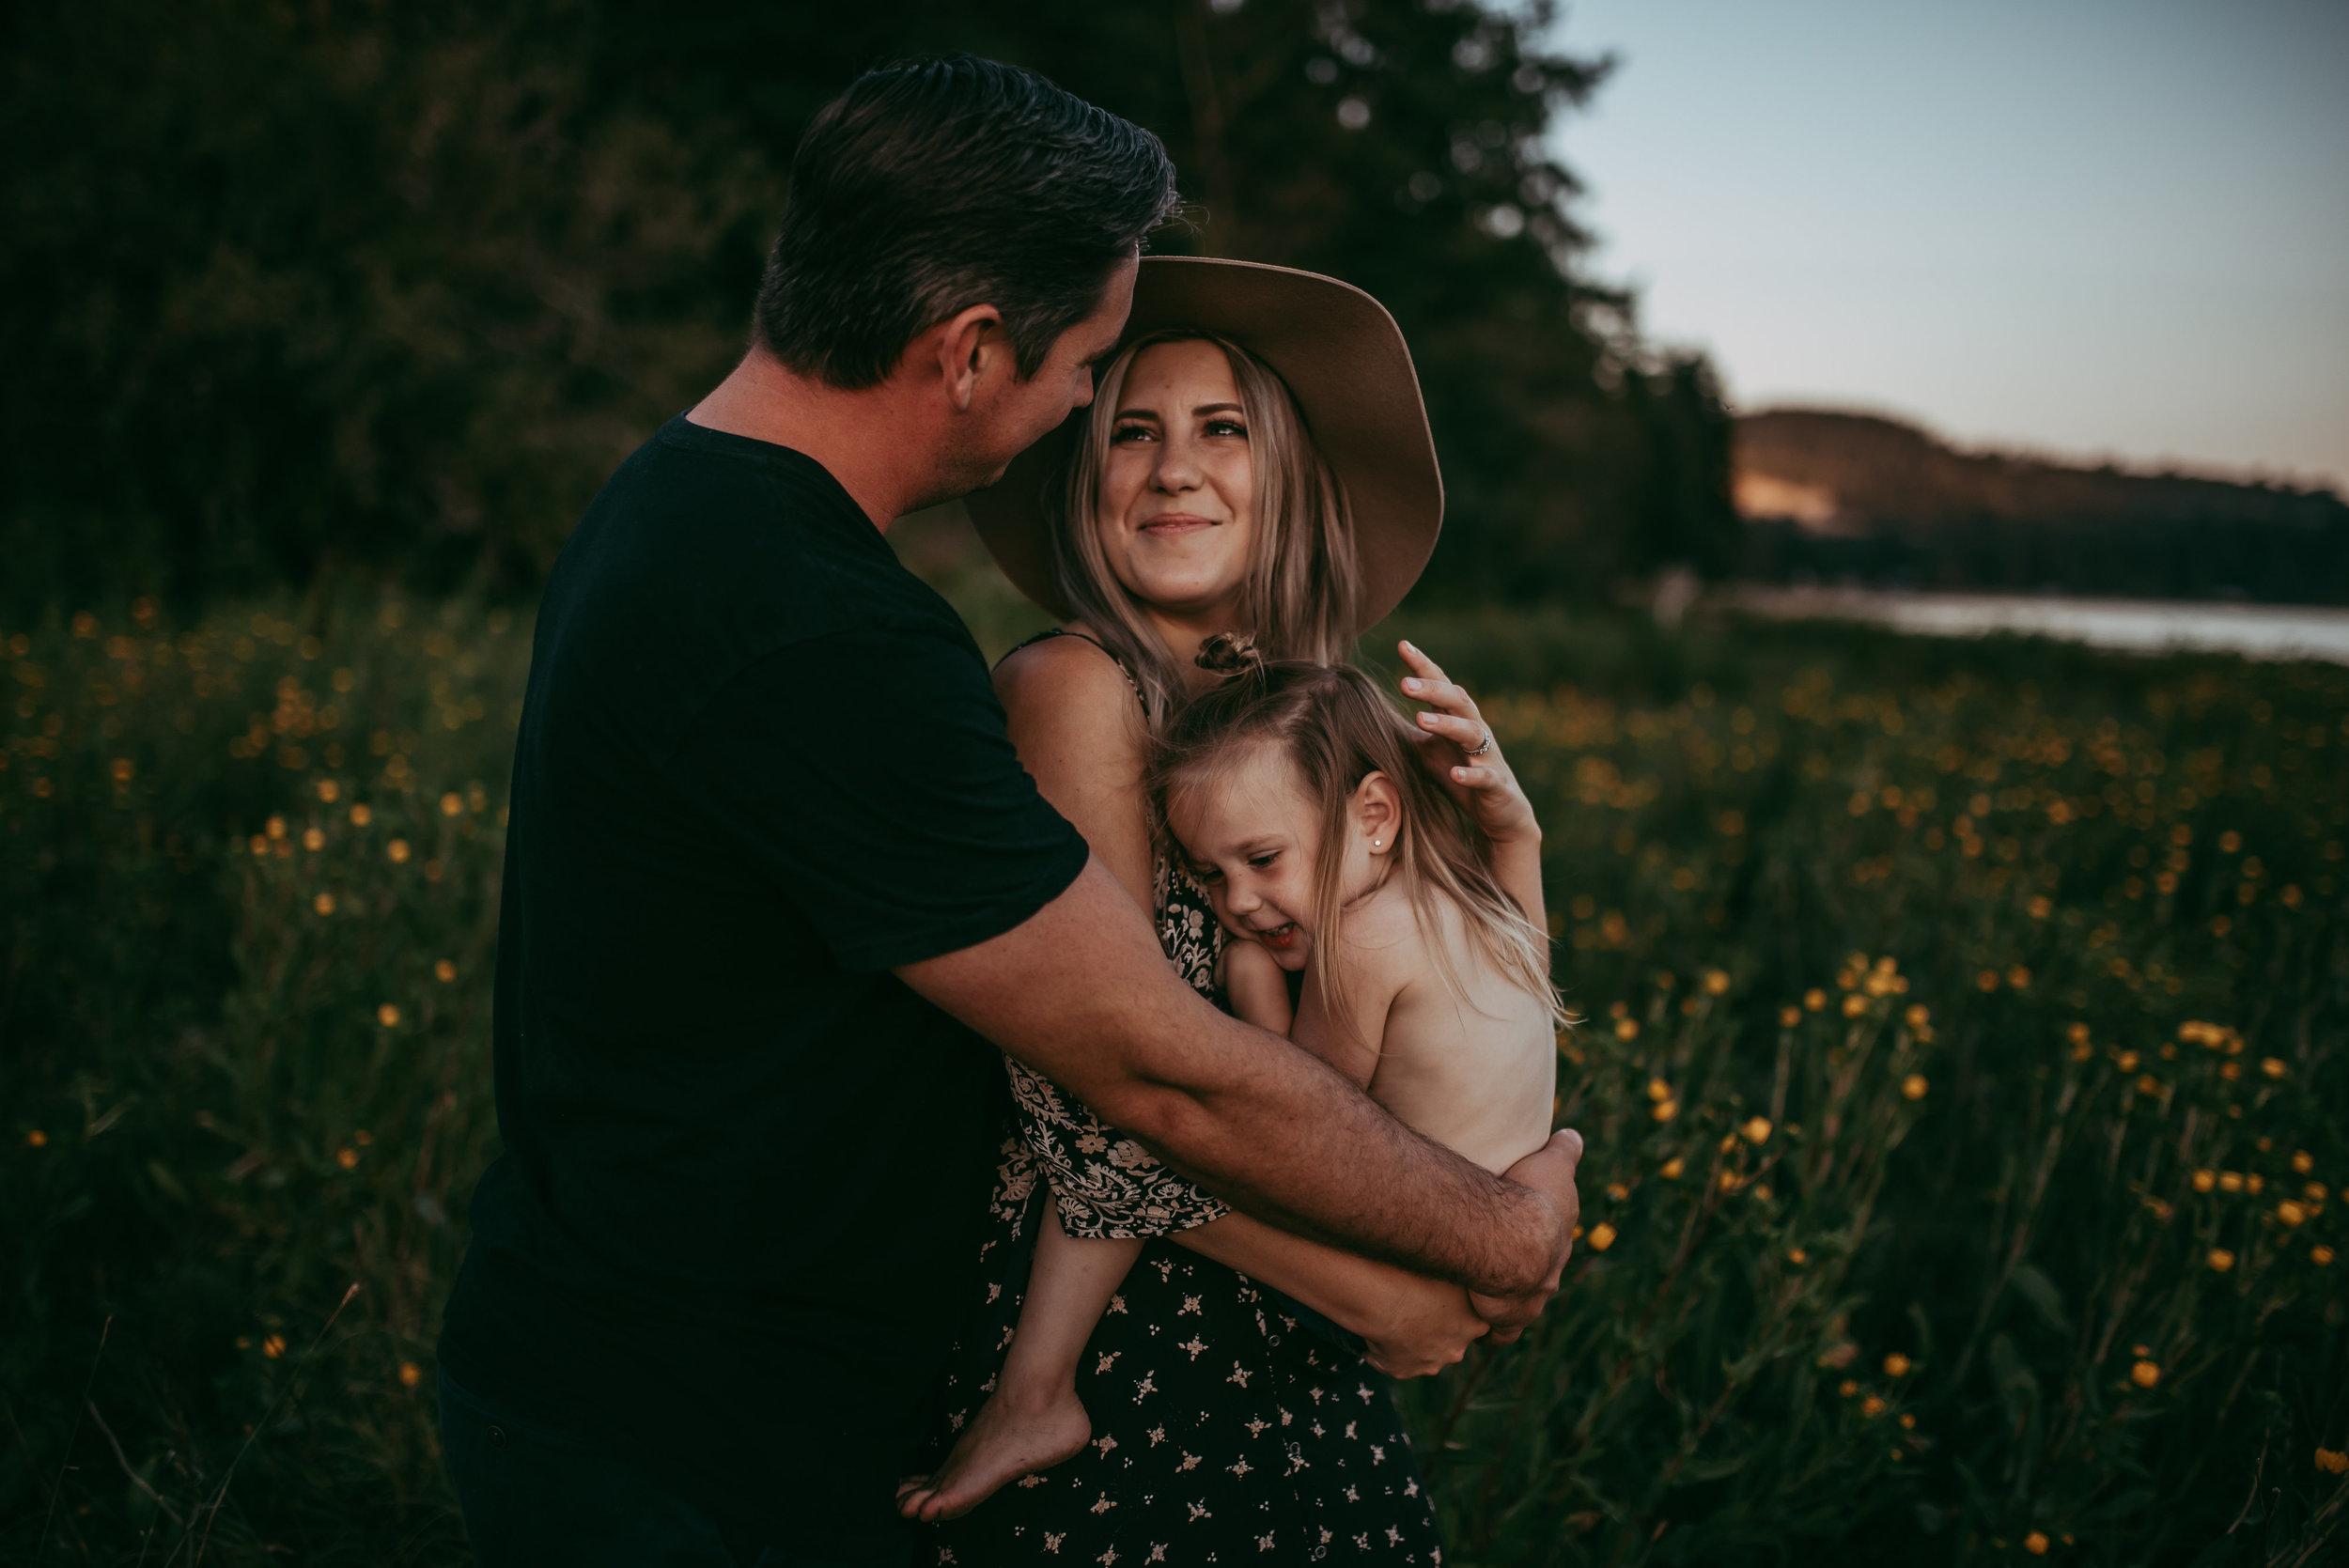 The Mclachlan Family-The Mclachlan Family-0206.jpg